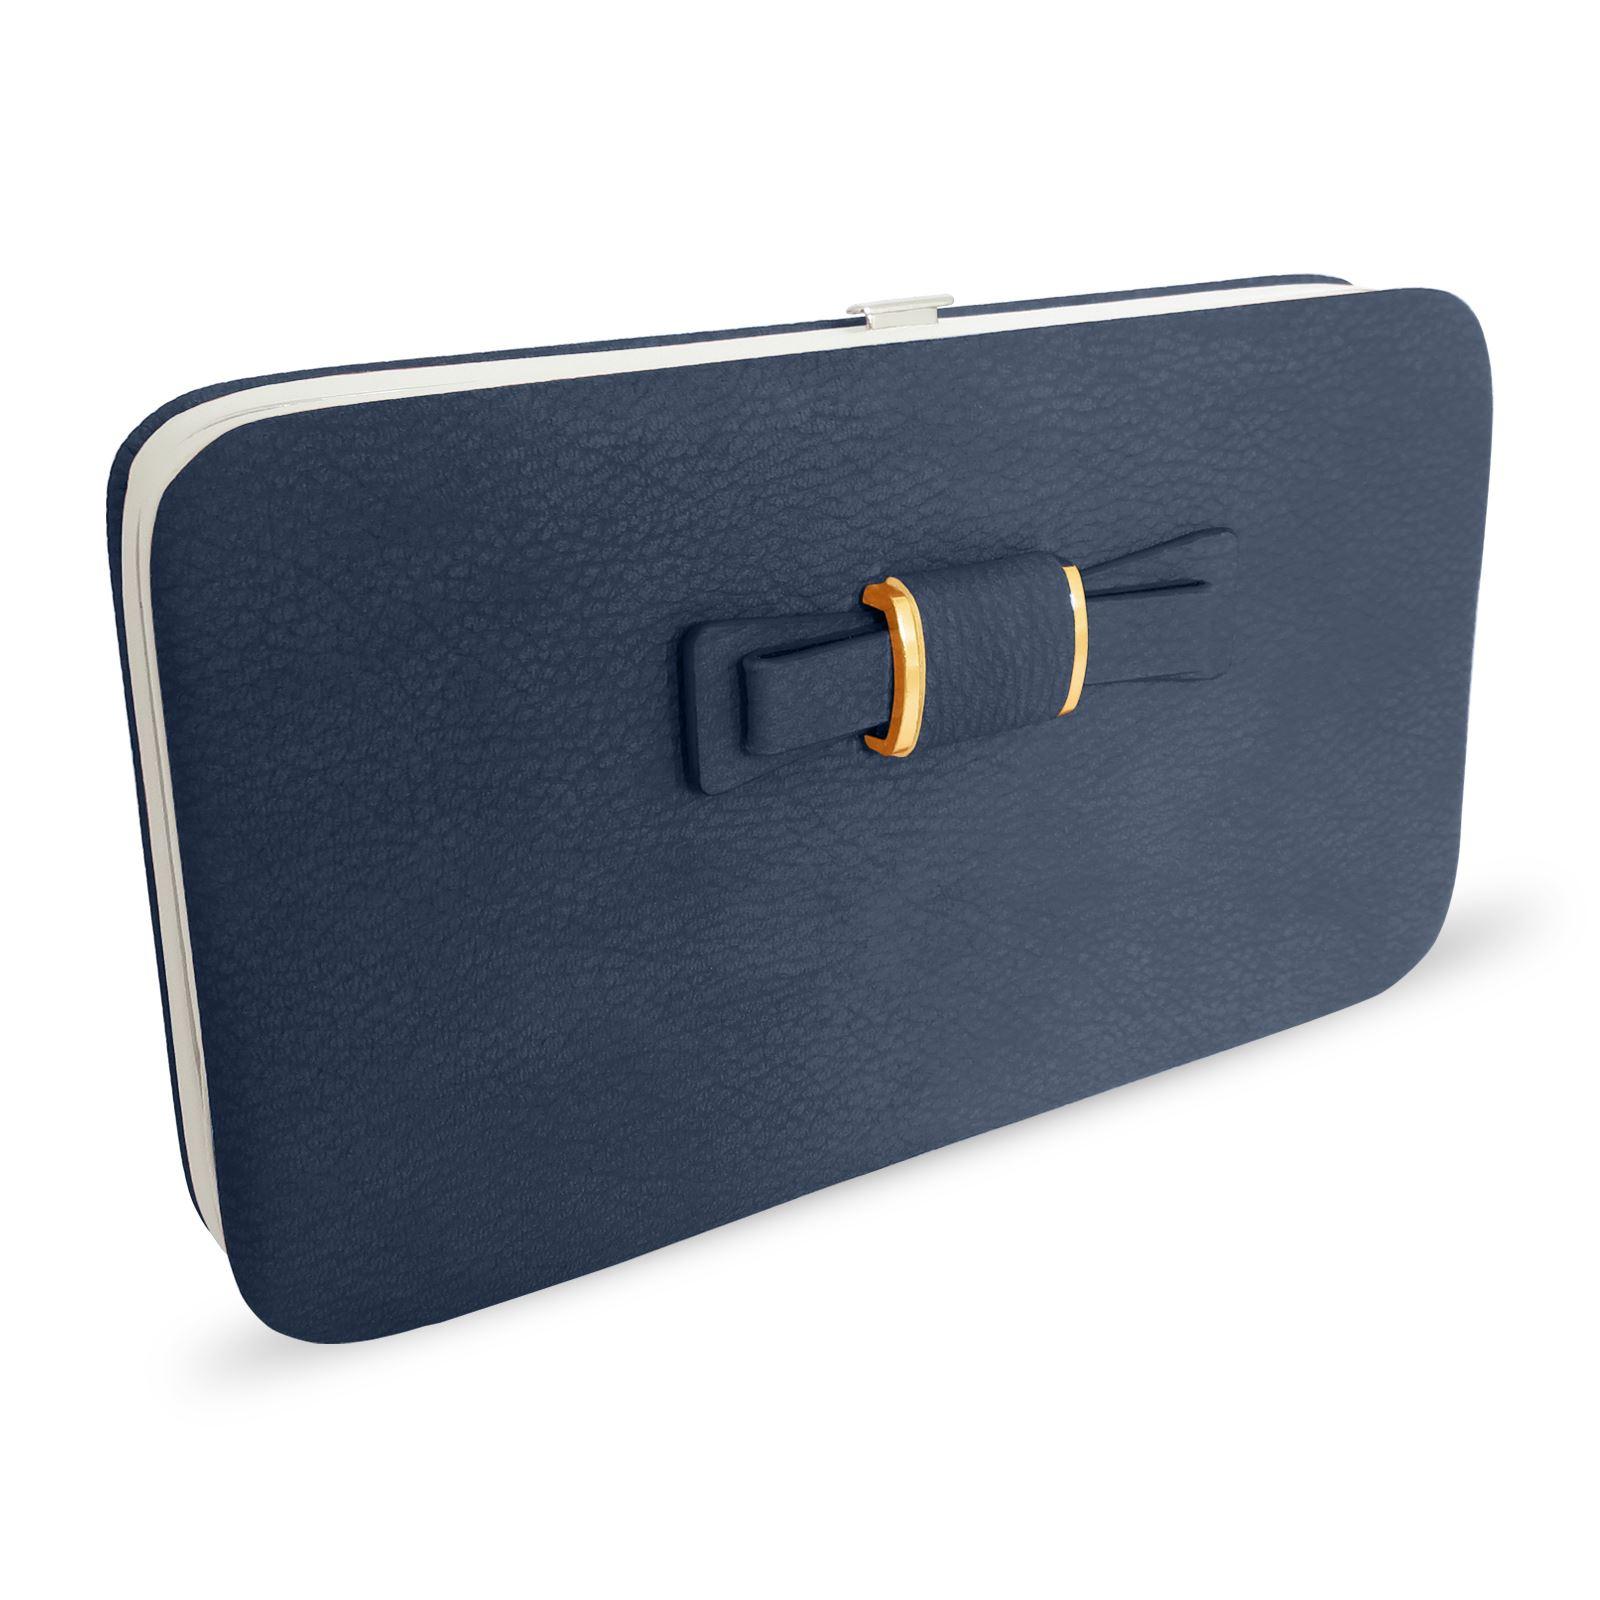 Ladies-Fashion-Long-Wallet-Purse-Card-Phone-Holder-Clutch-Button-Handbag-Case